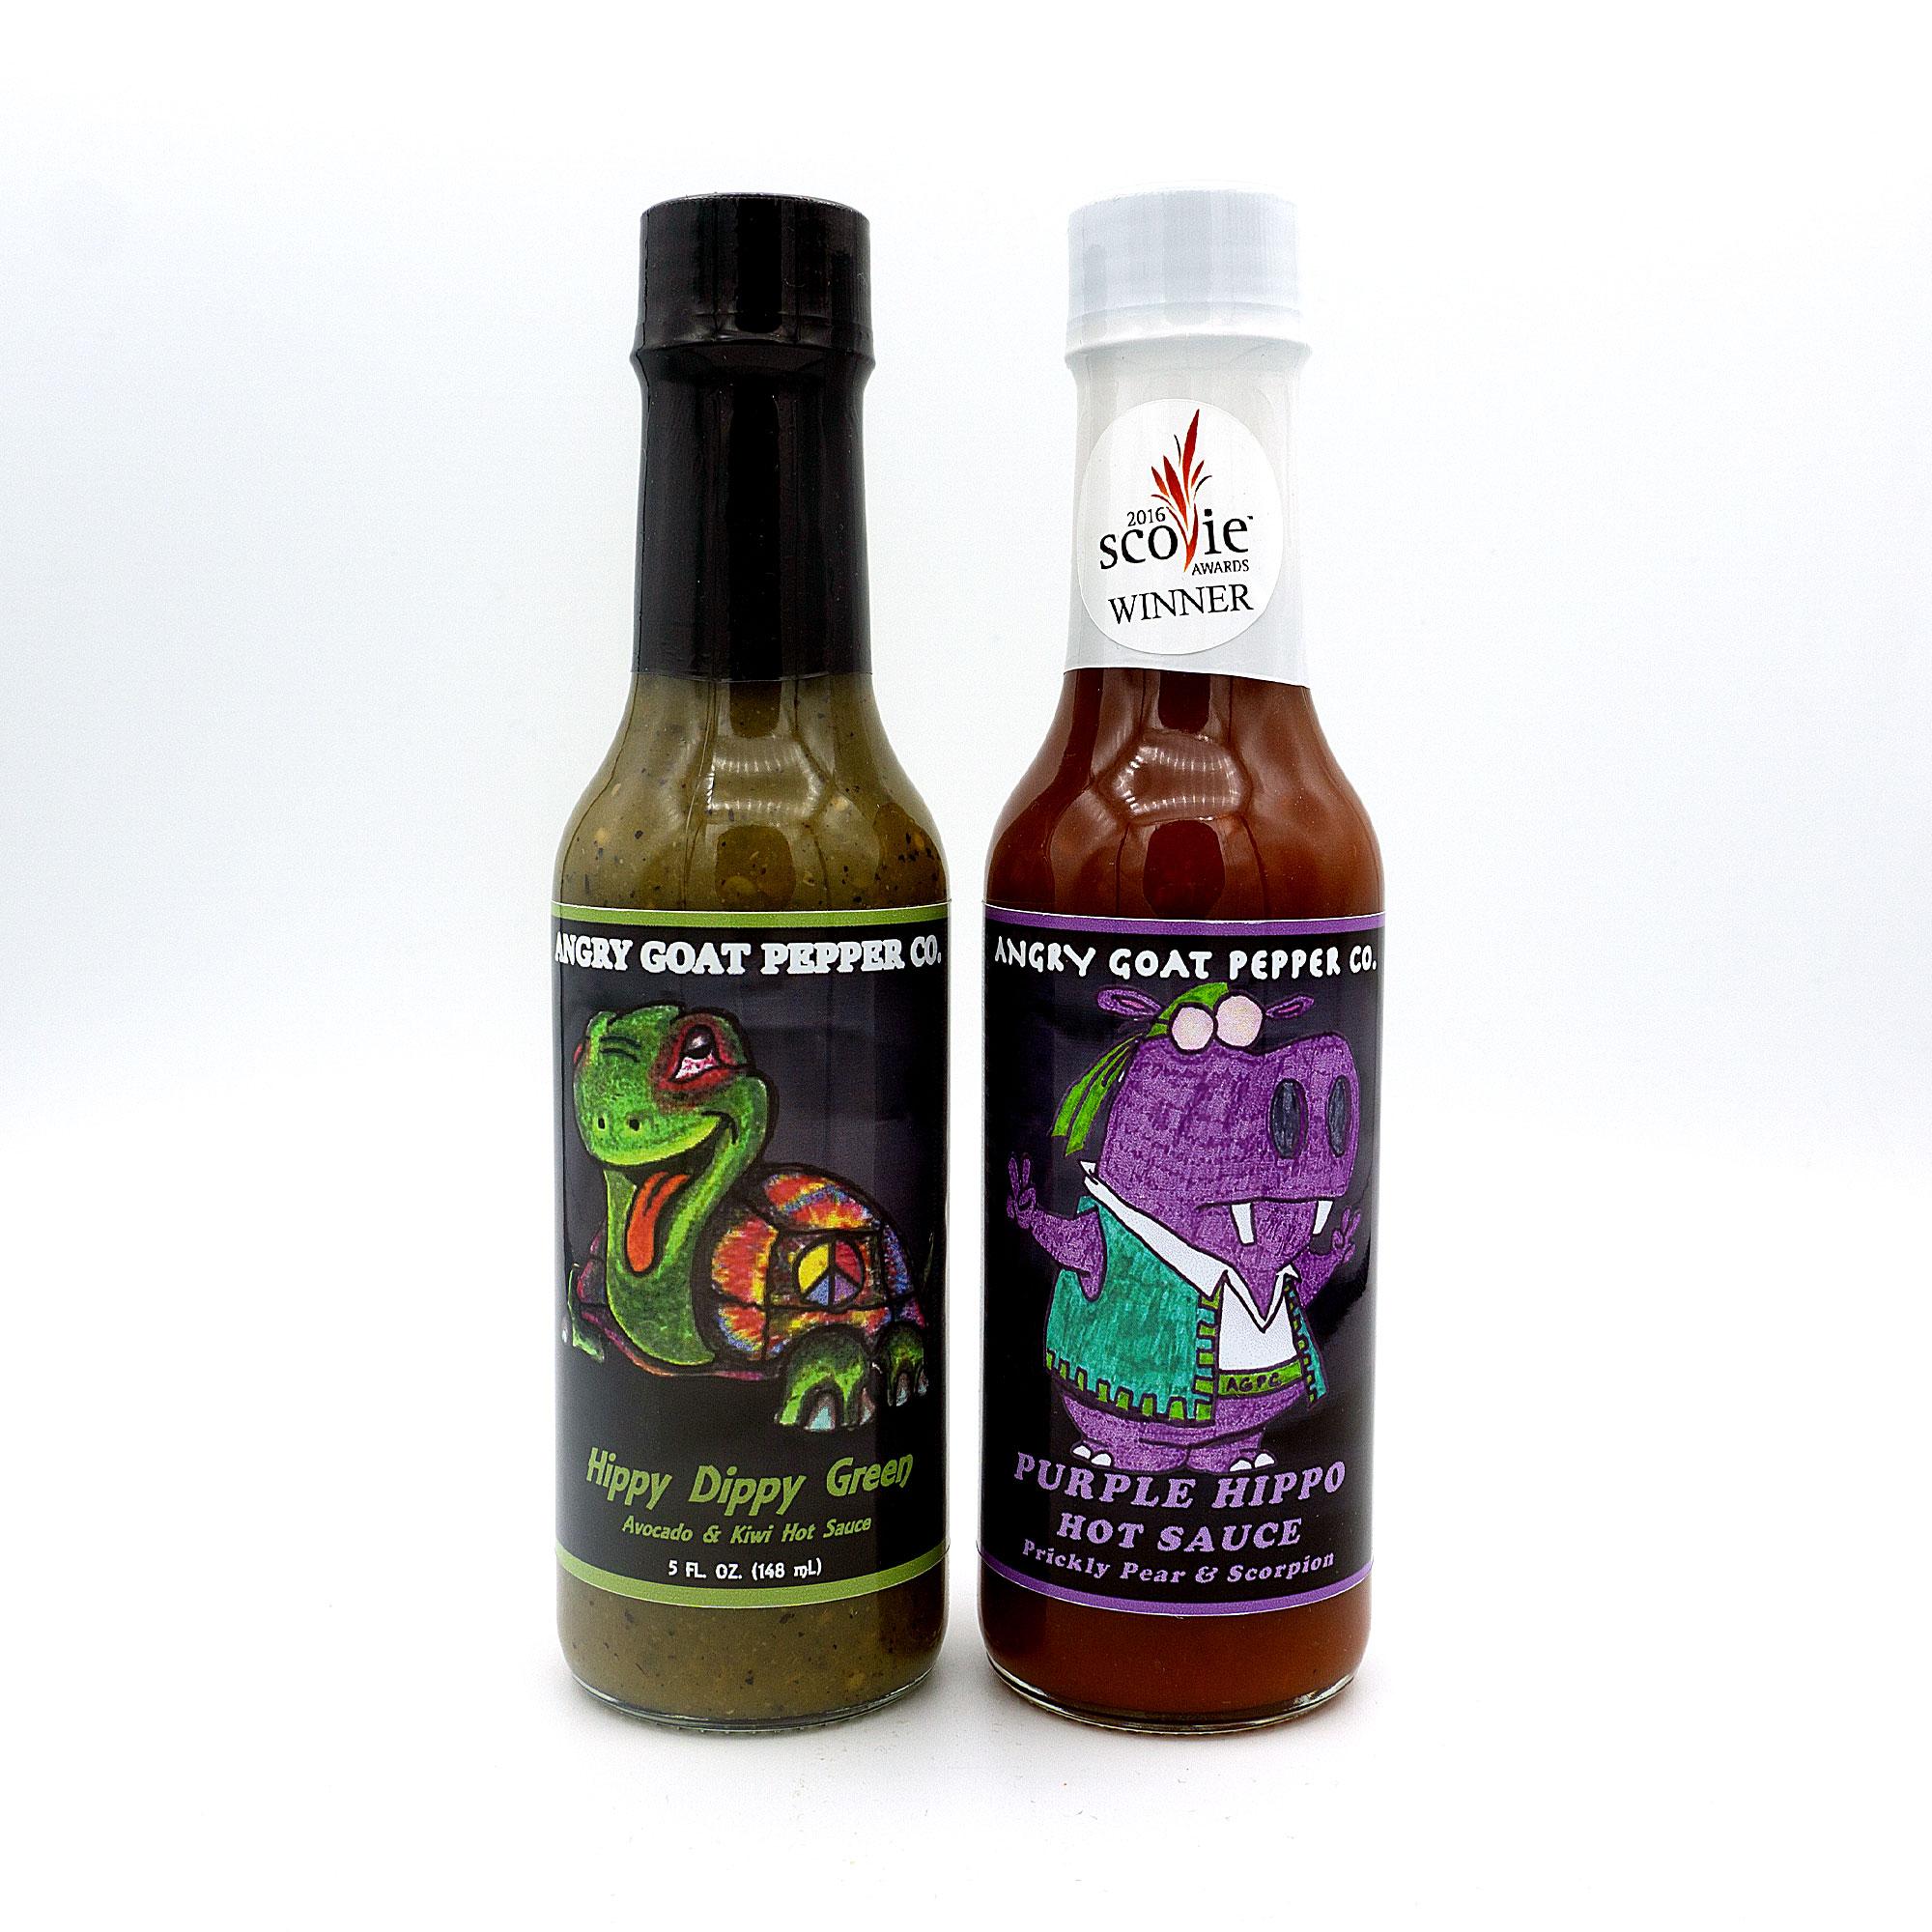 Angry Goat Pepper Company   Mat's Hot Shop - Australia's Premier Hot Sauce Store